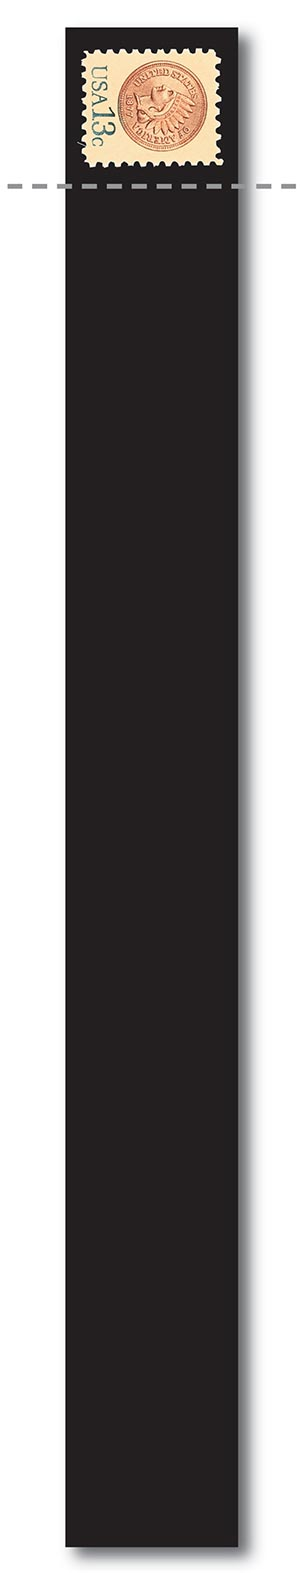 "Scott Mount 215 x 20mm (5.46 x .79"") US 19th Century Horizontal Coil  22 pack"